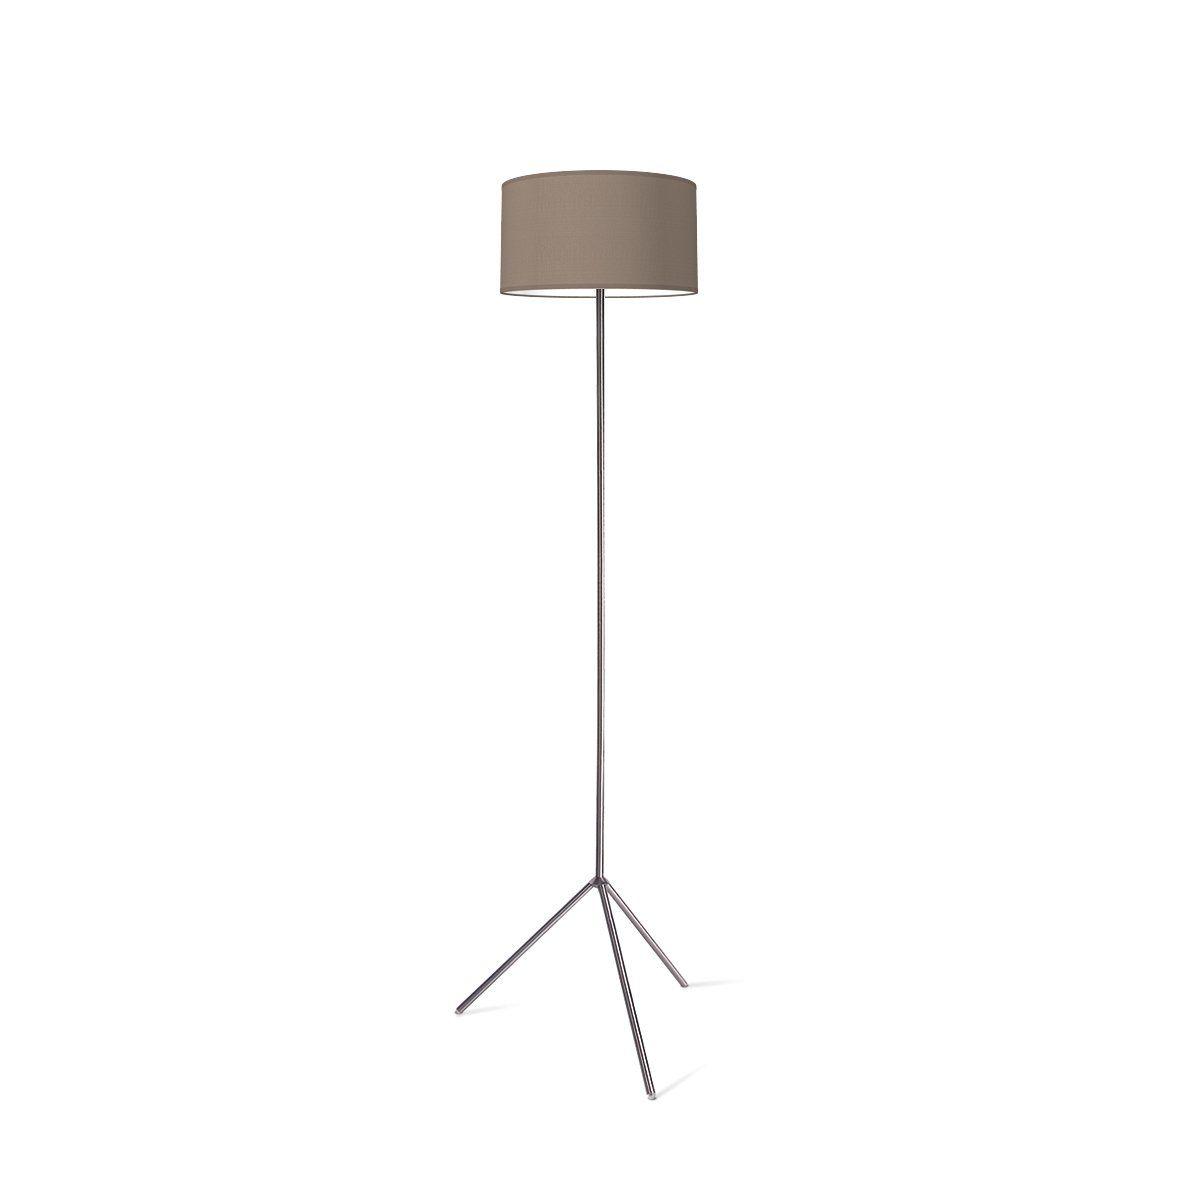 vloerlamp karma bling Ø 40 cm - taupe